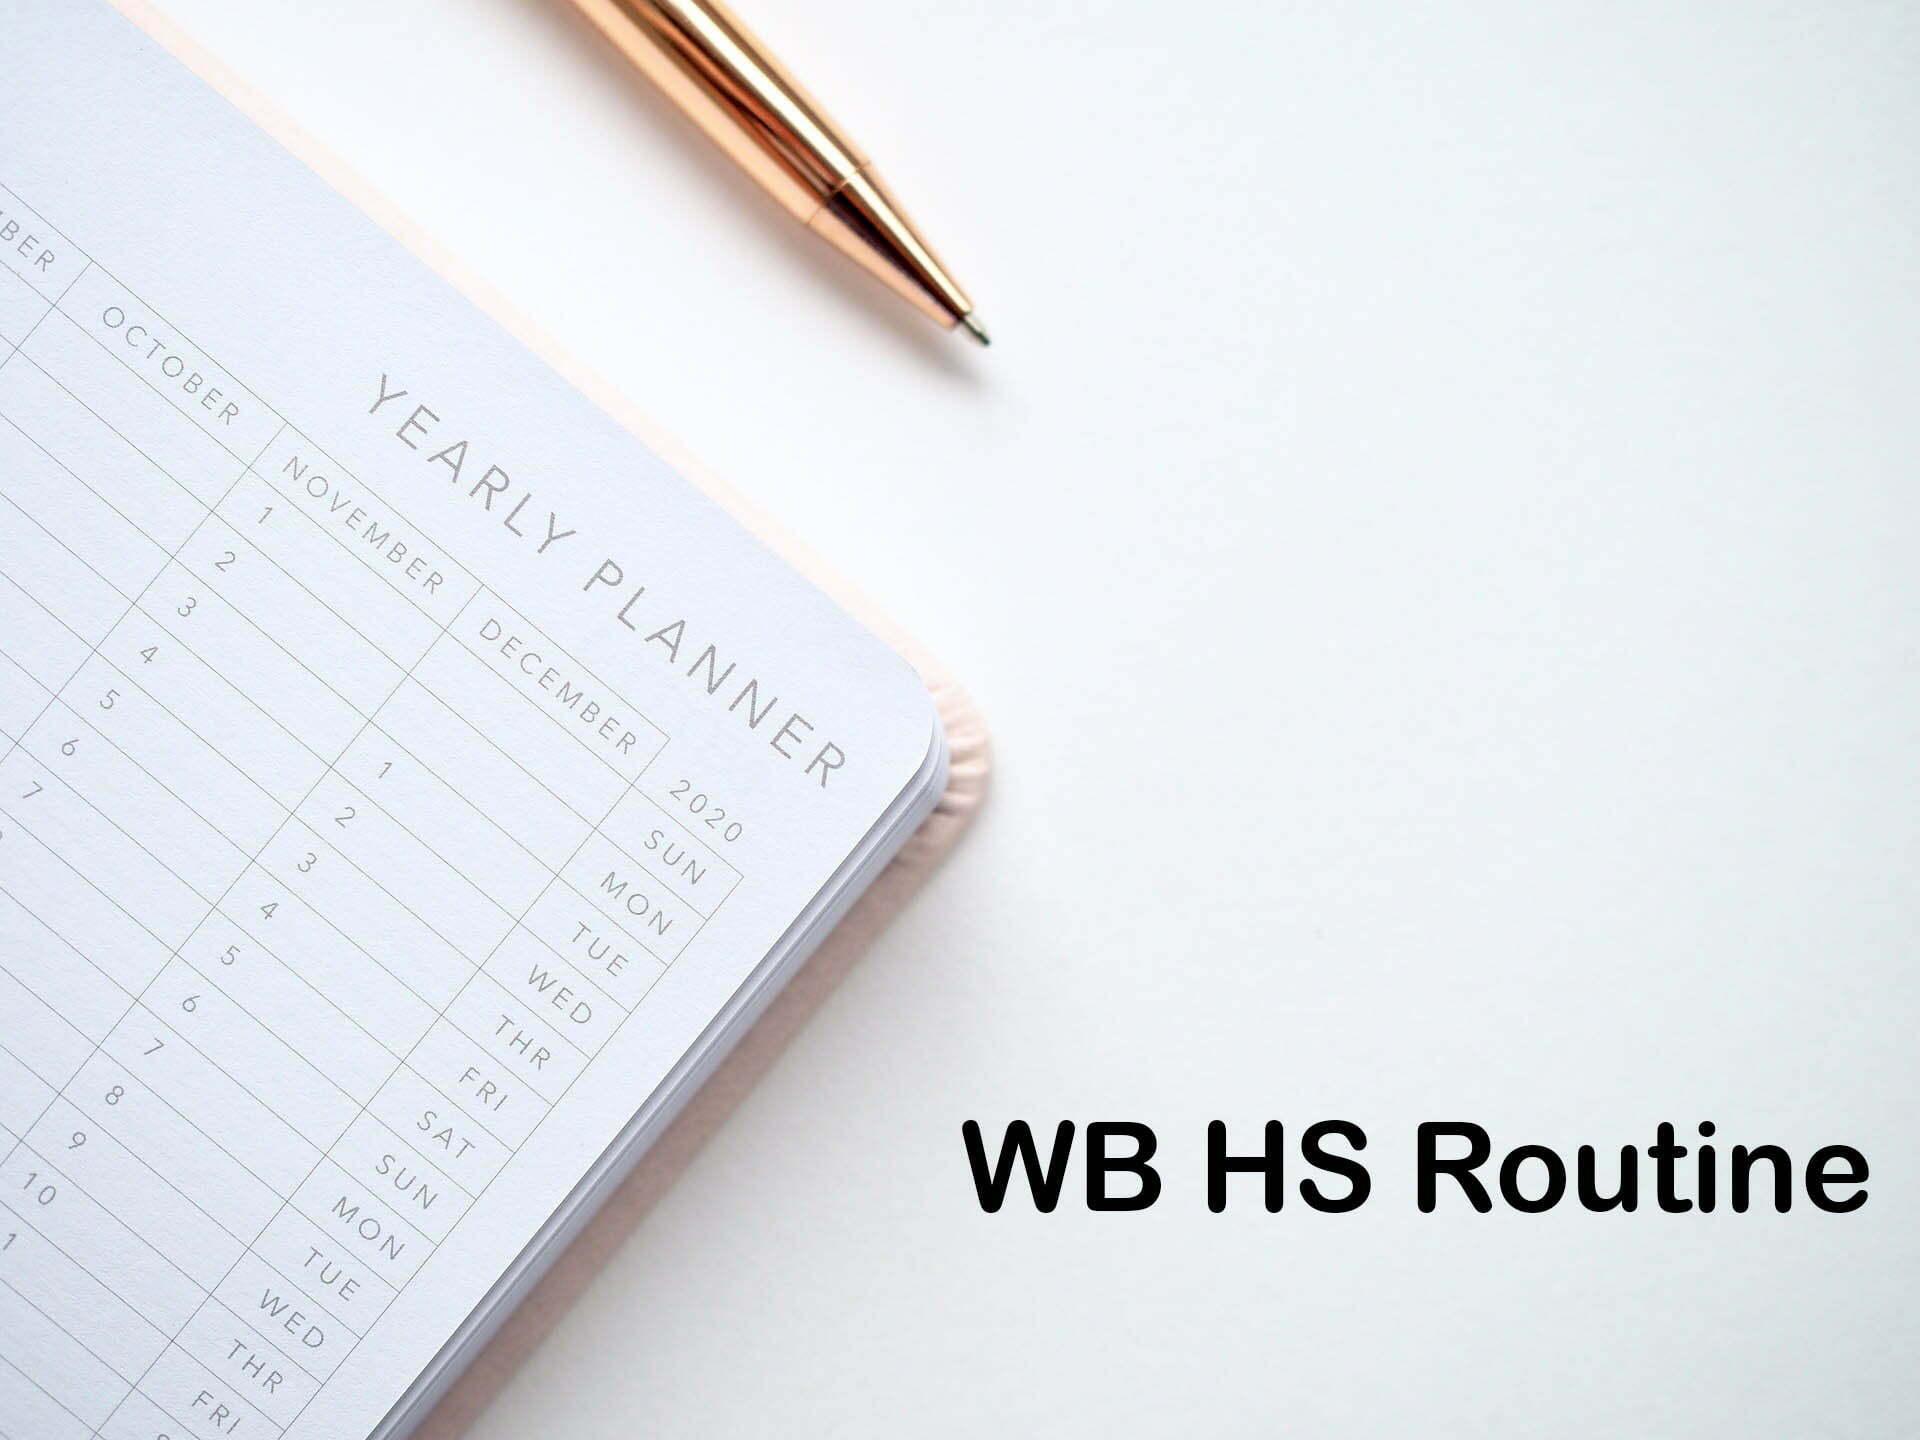 WB HS Routine